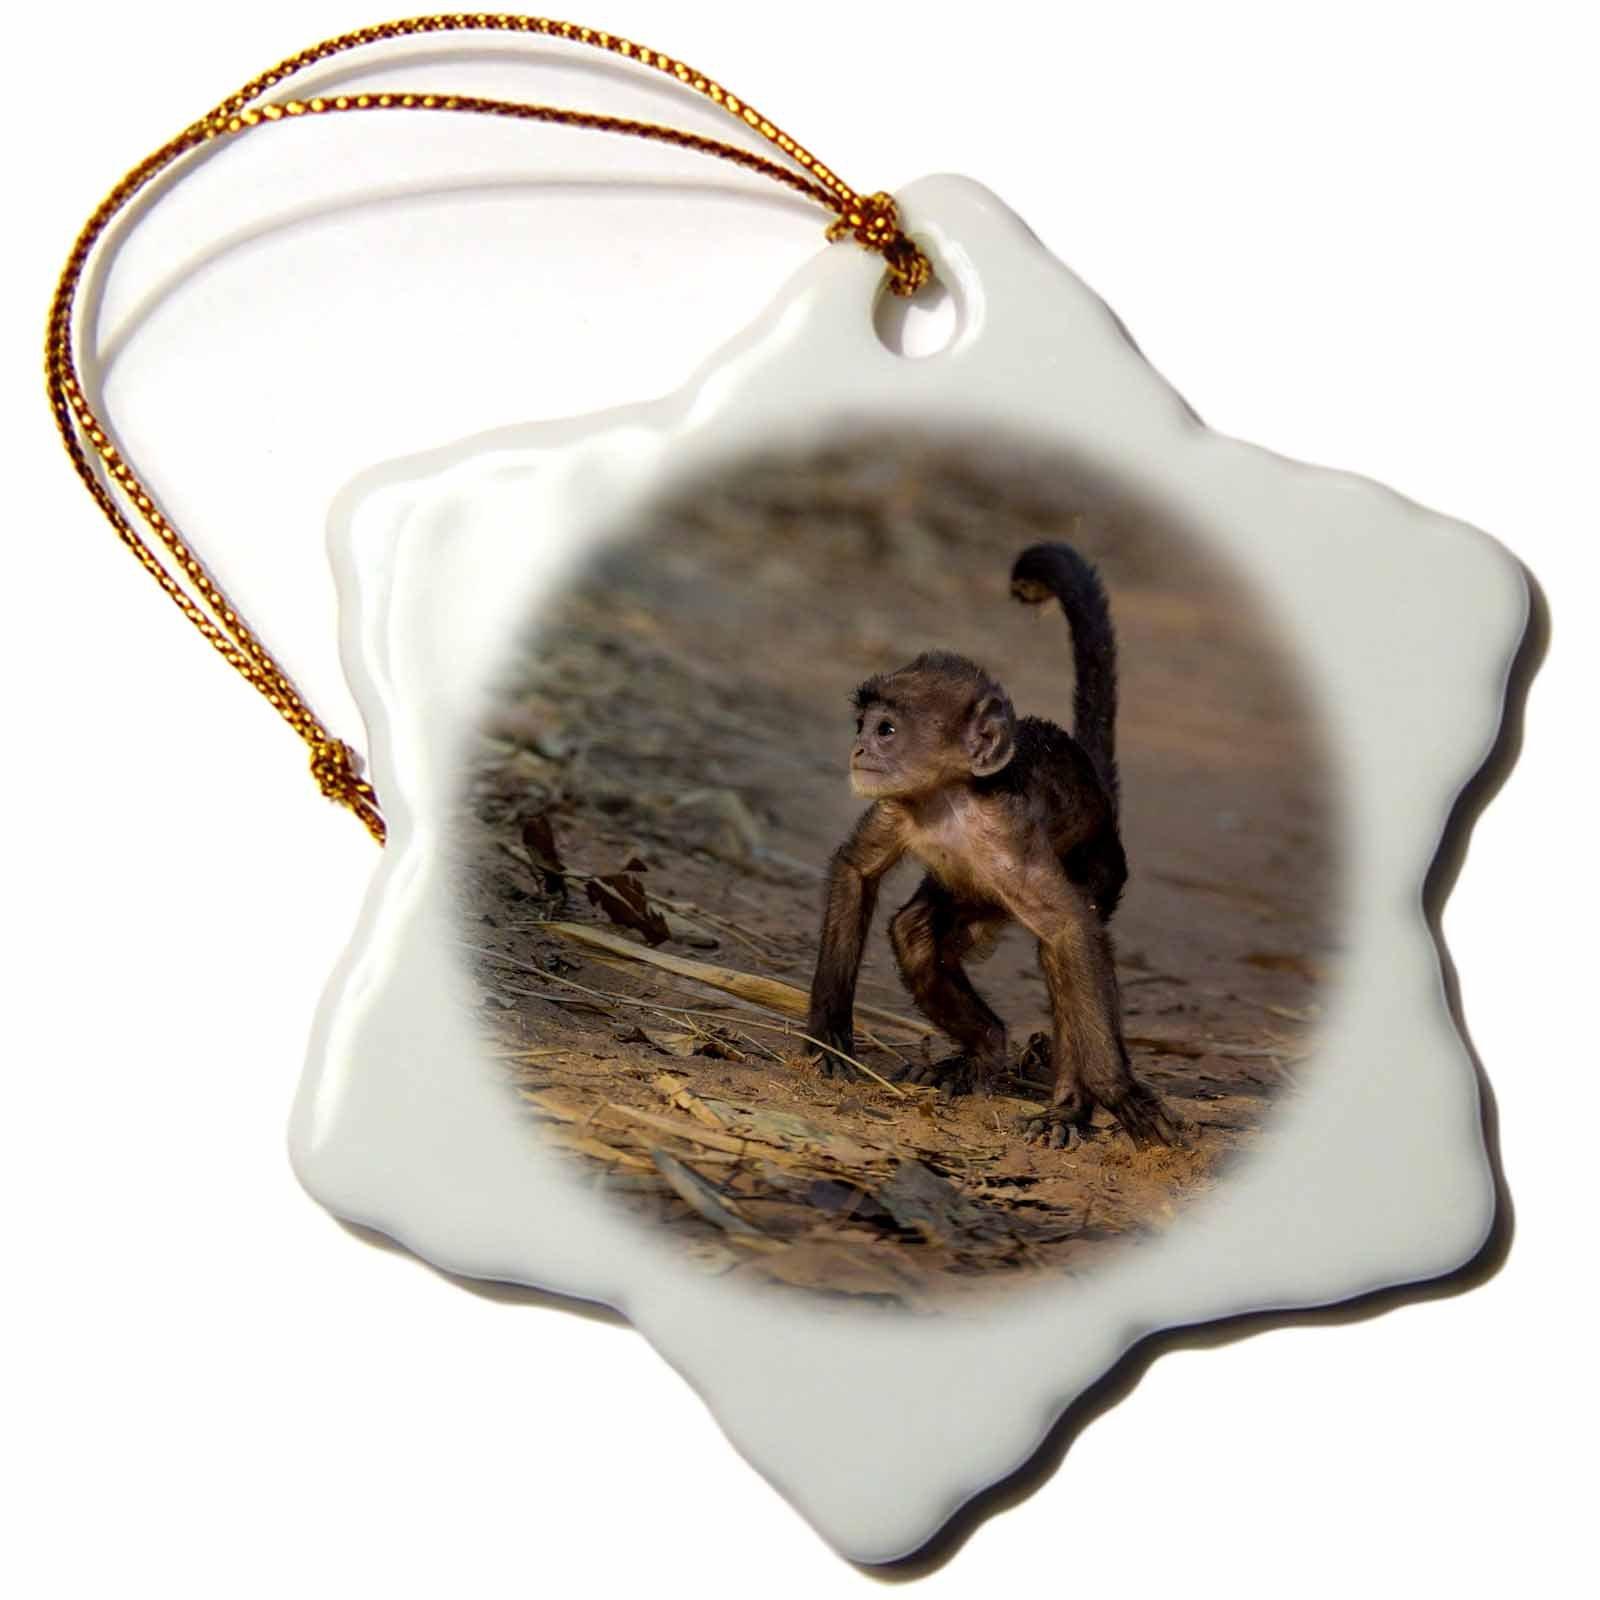 3dRose Danita Delimont - Baby animals - India. Hanuman langur at Bandhavgarh Tiger Reserve - 3 inch Snowflake Porcelain Ornament (orn_276803_1)